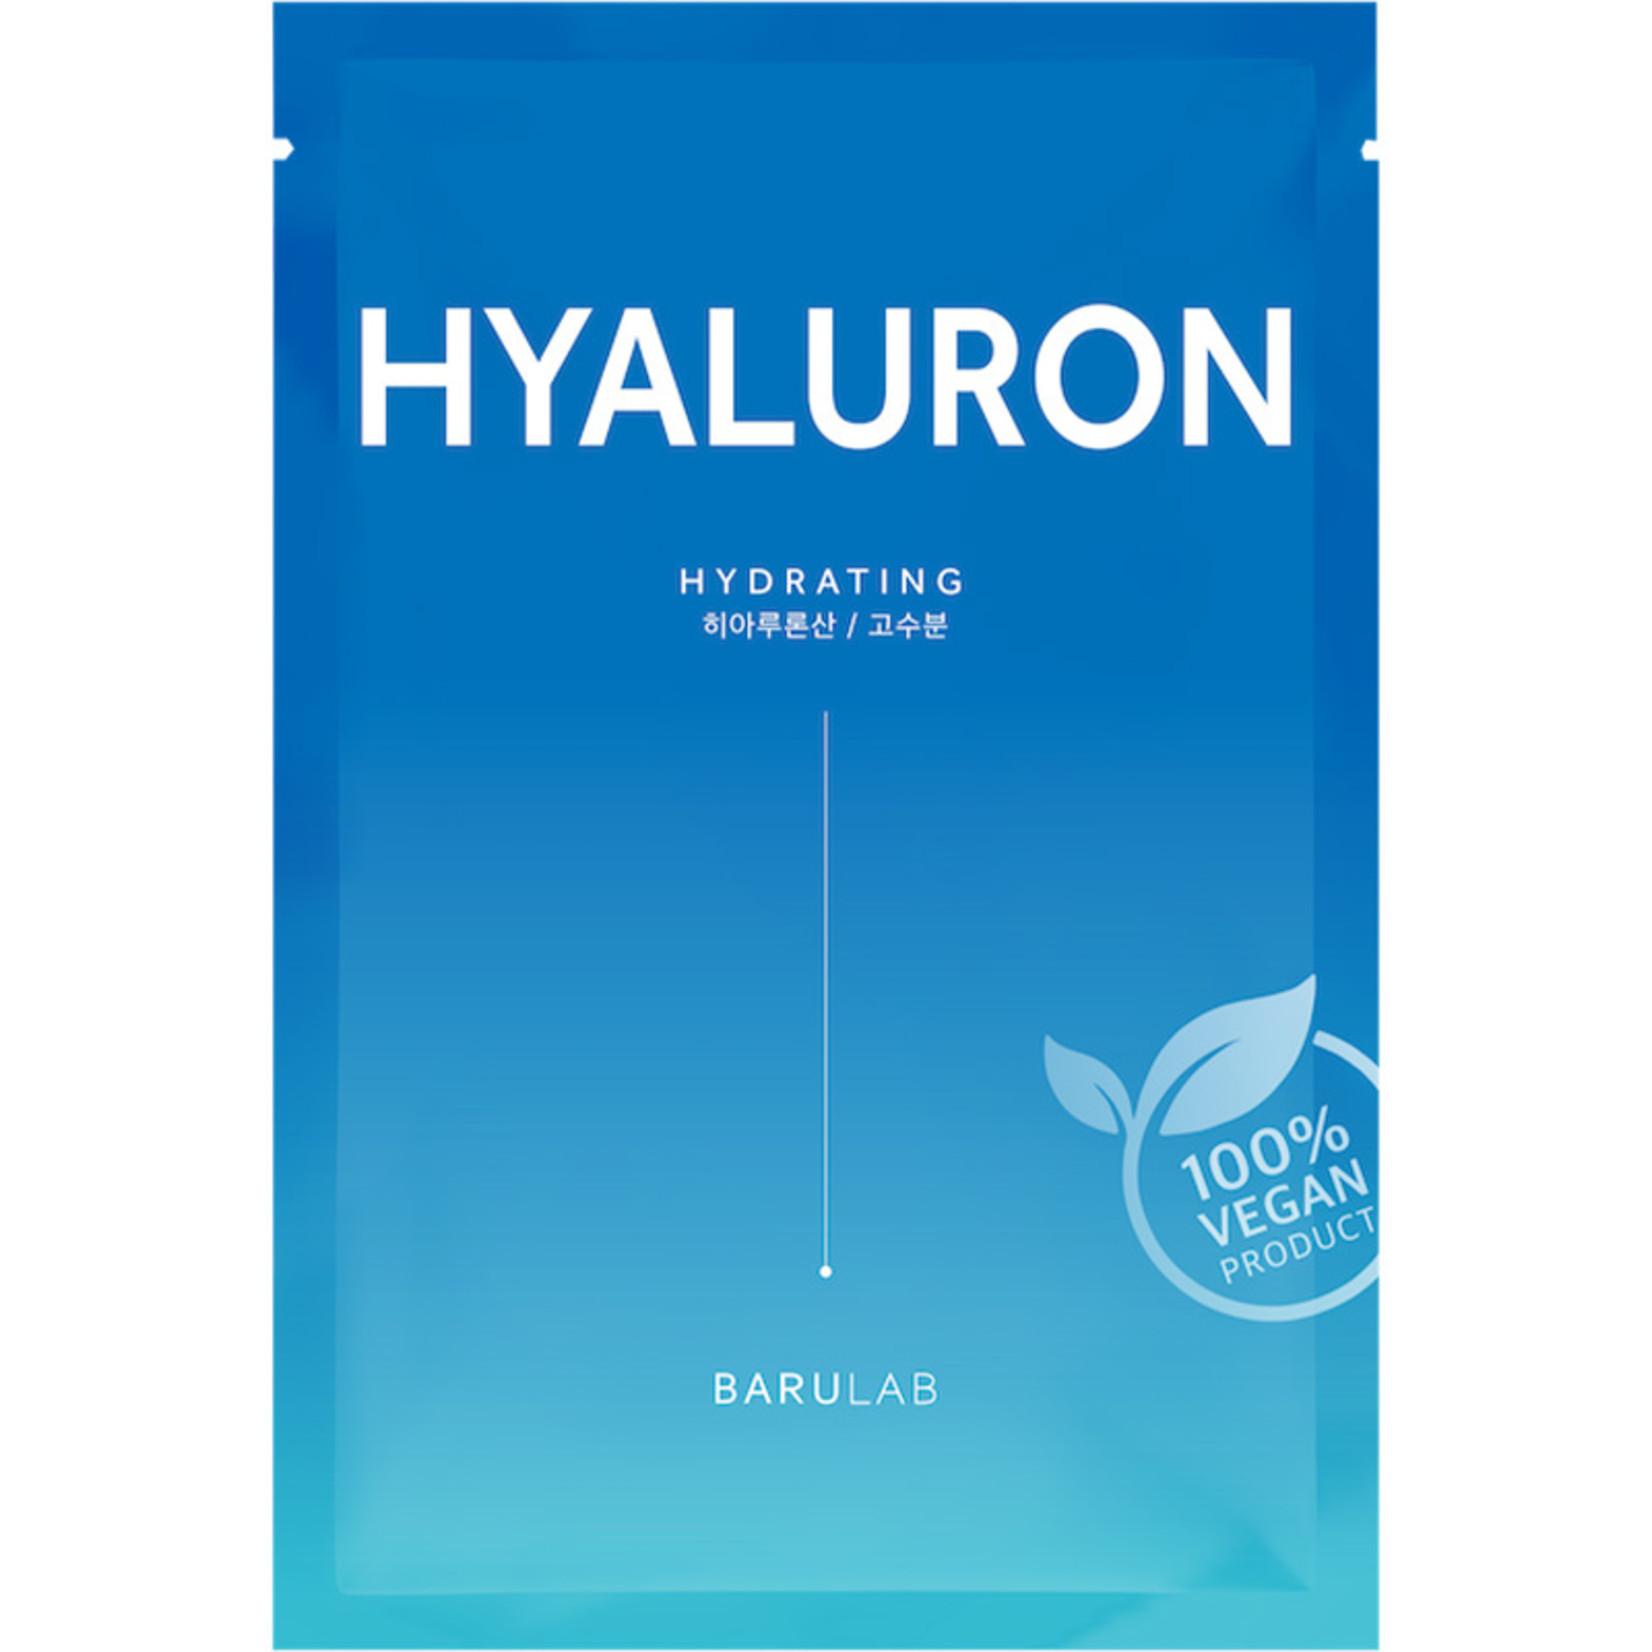 BARULAB The Clean Vegan Mask - Hyaluron